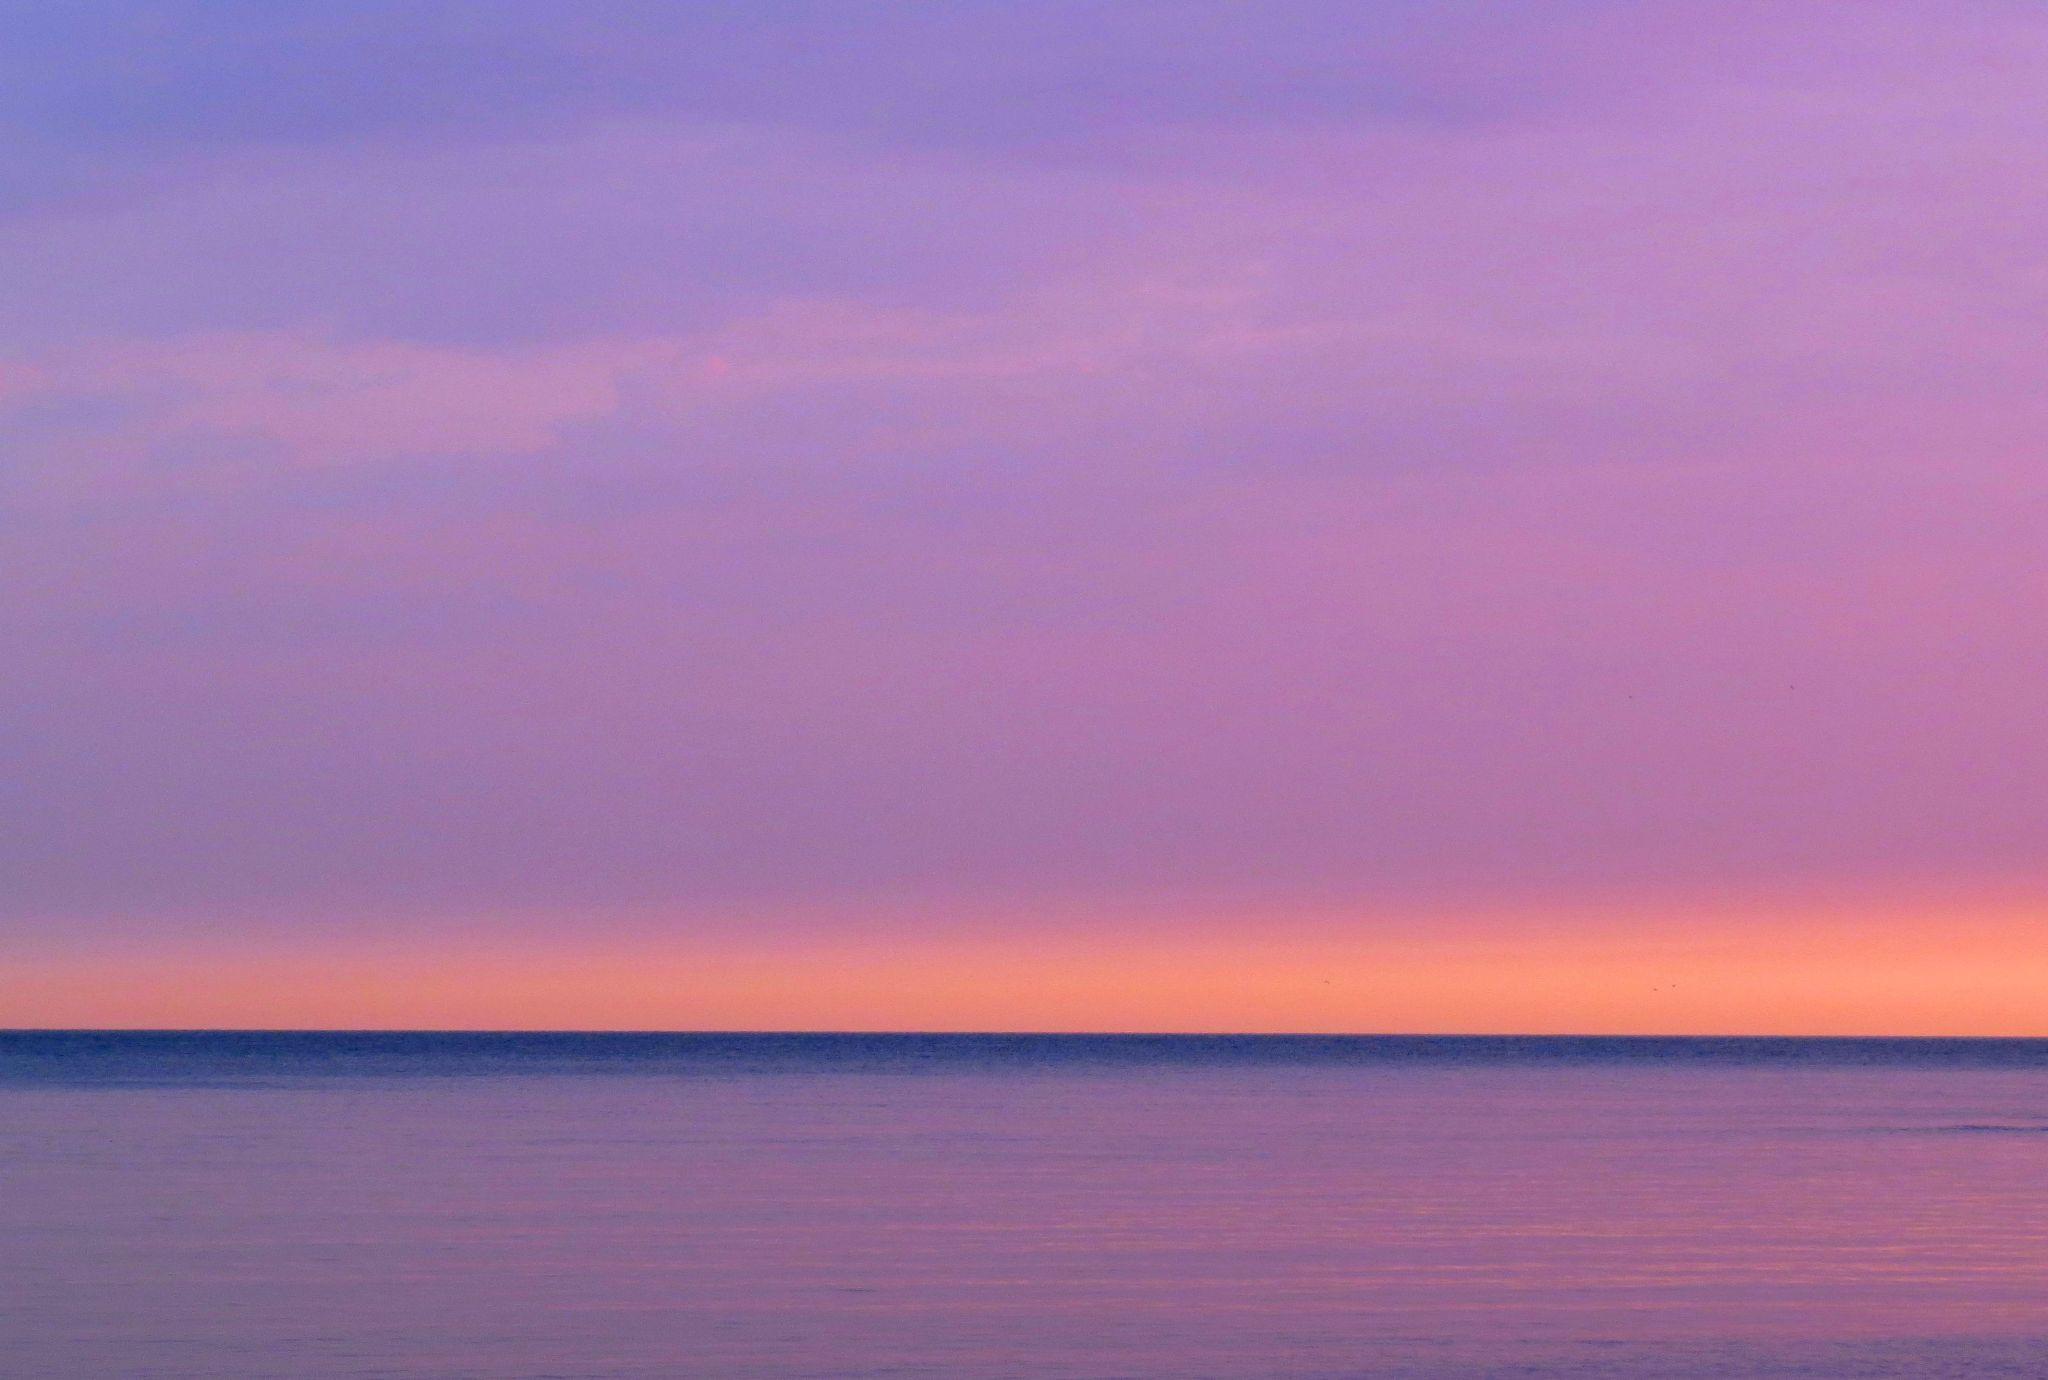 Pastel sunrise by pennieawhite